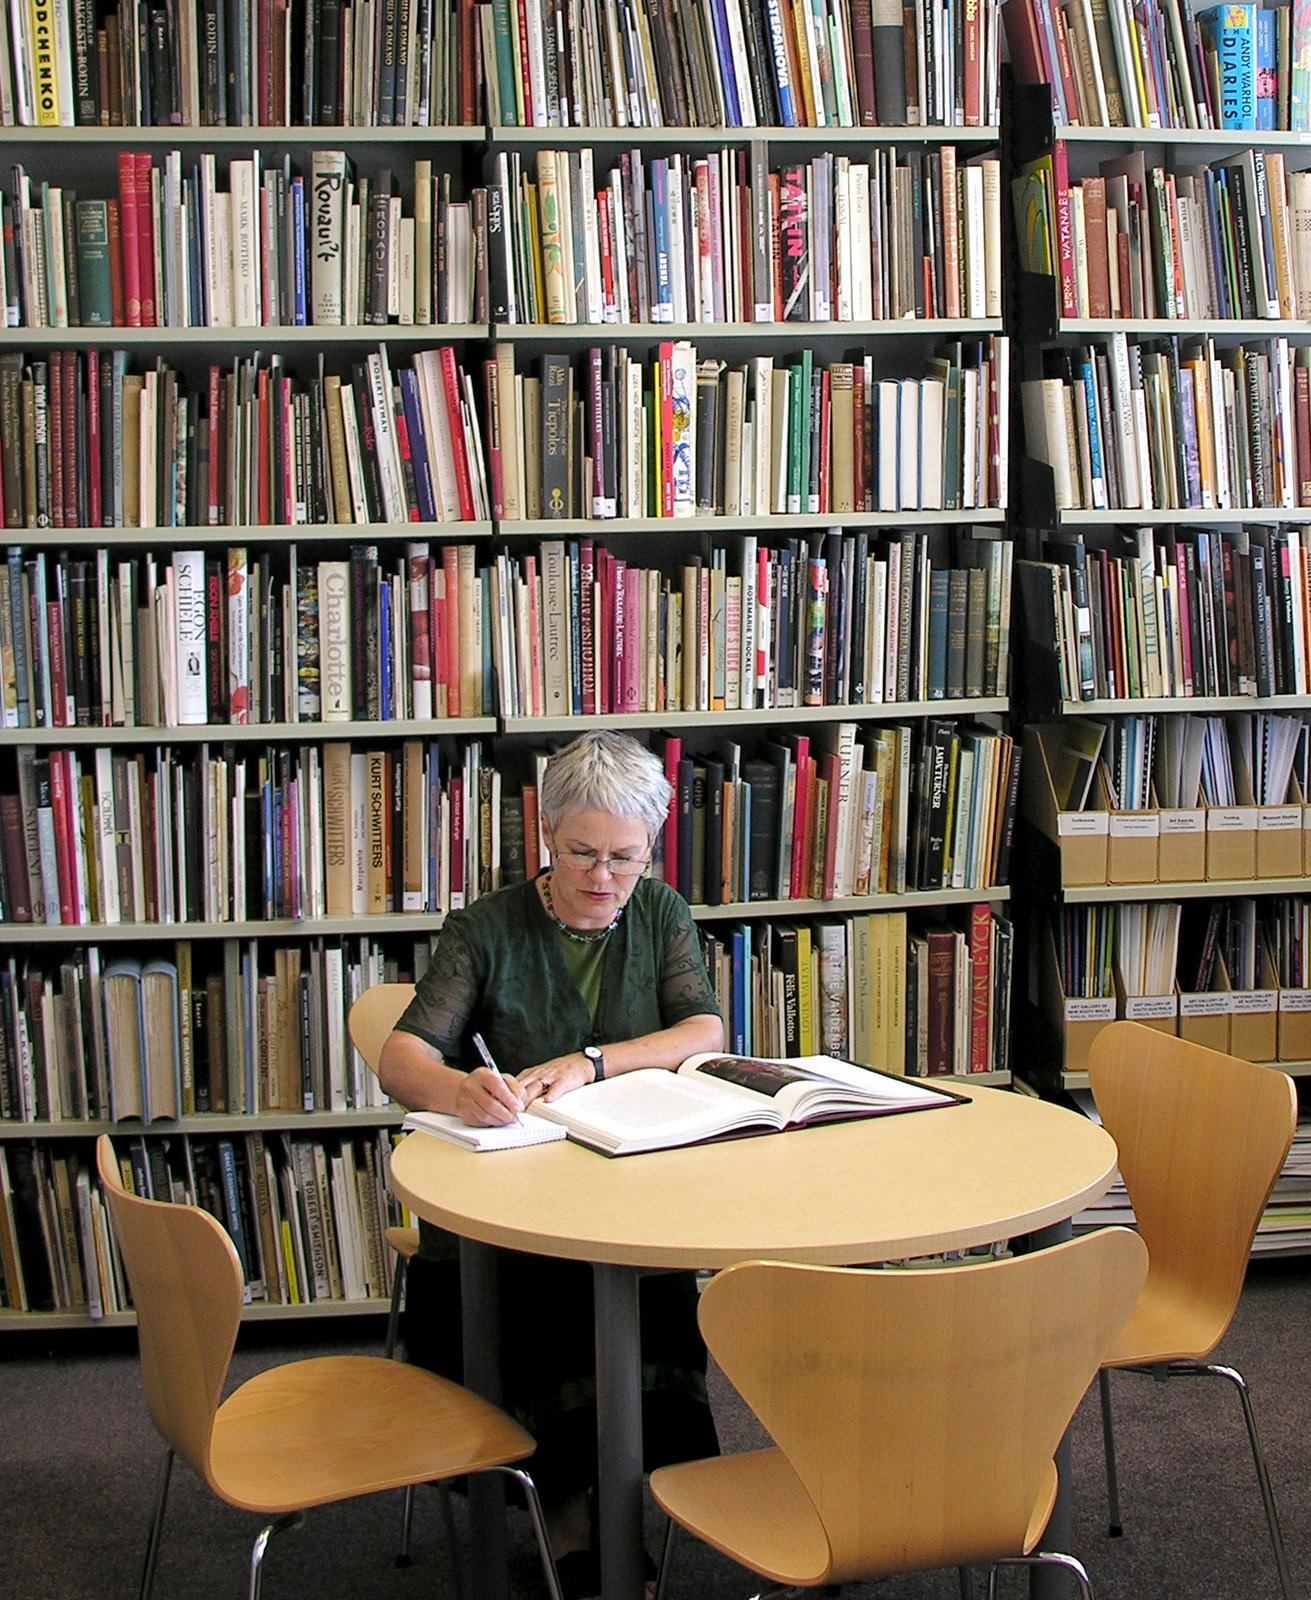 http://rfacdn.nz/artgallery/assets/media/blog-research-library-relocates-5.jpg